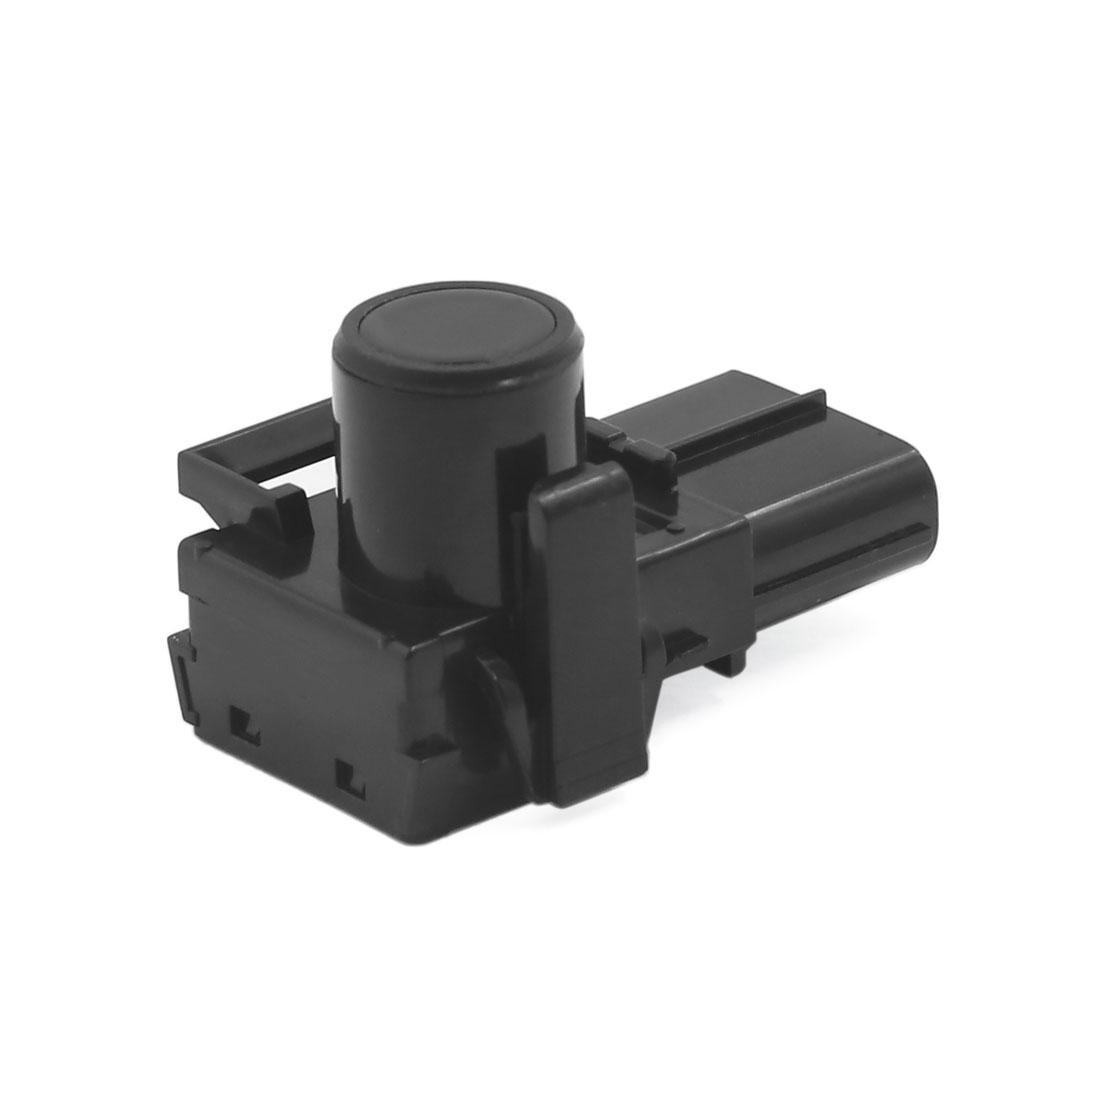 Black PDC Reverse Parking Sensor 89341-06030 for Toyota Camry ASV50L-JETVKC 2011